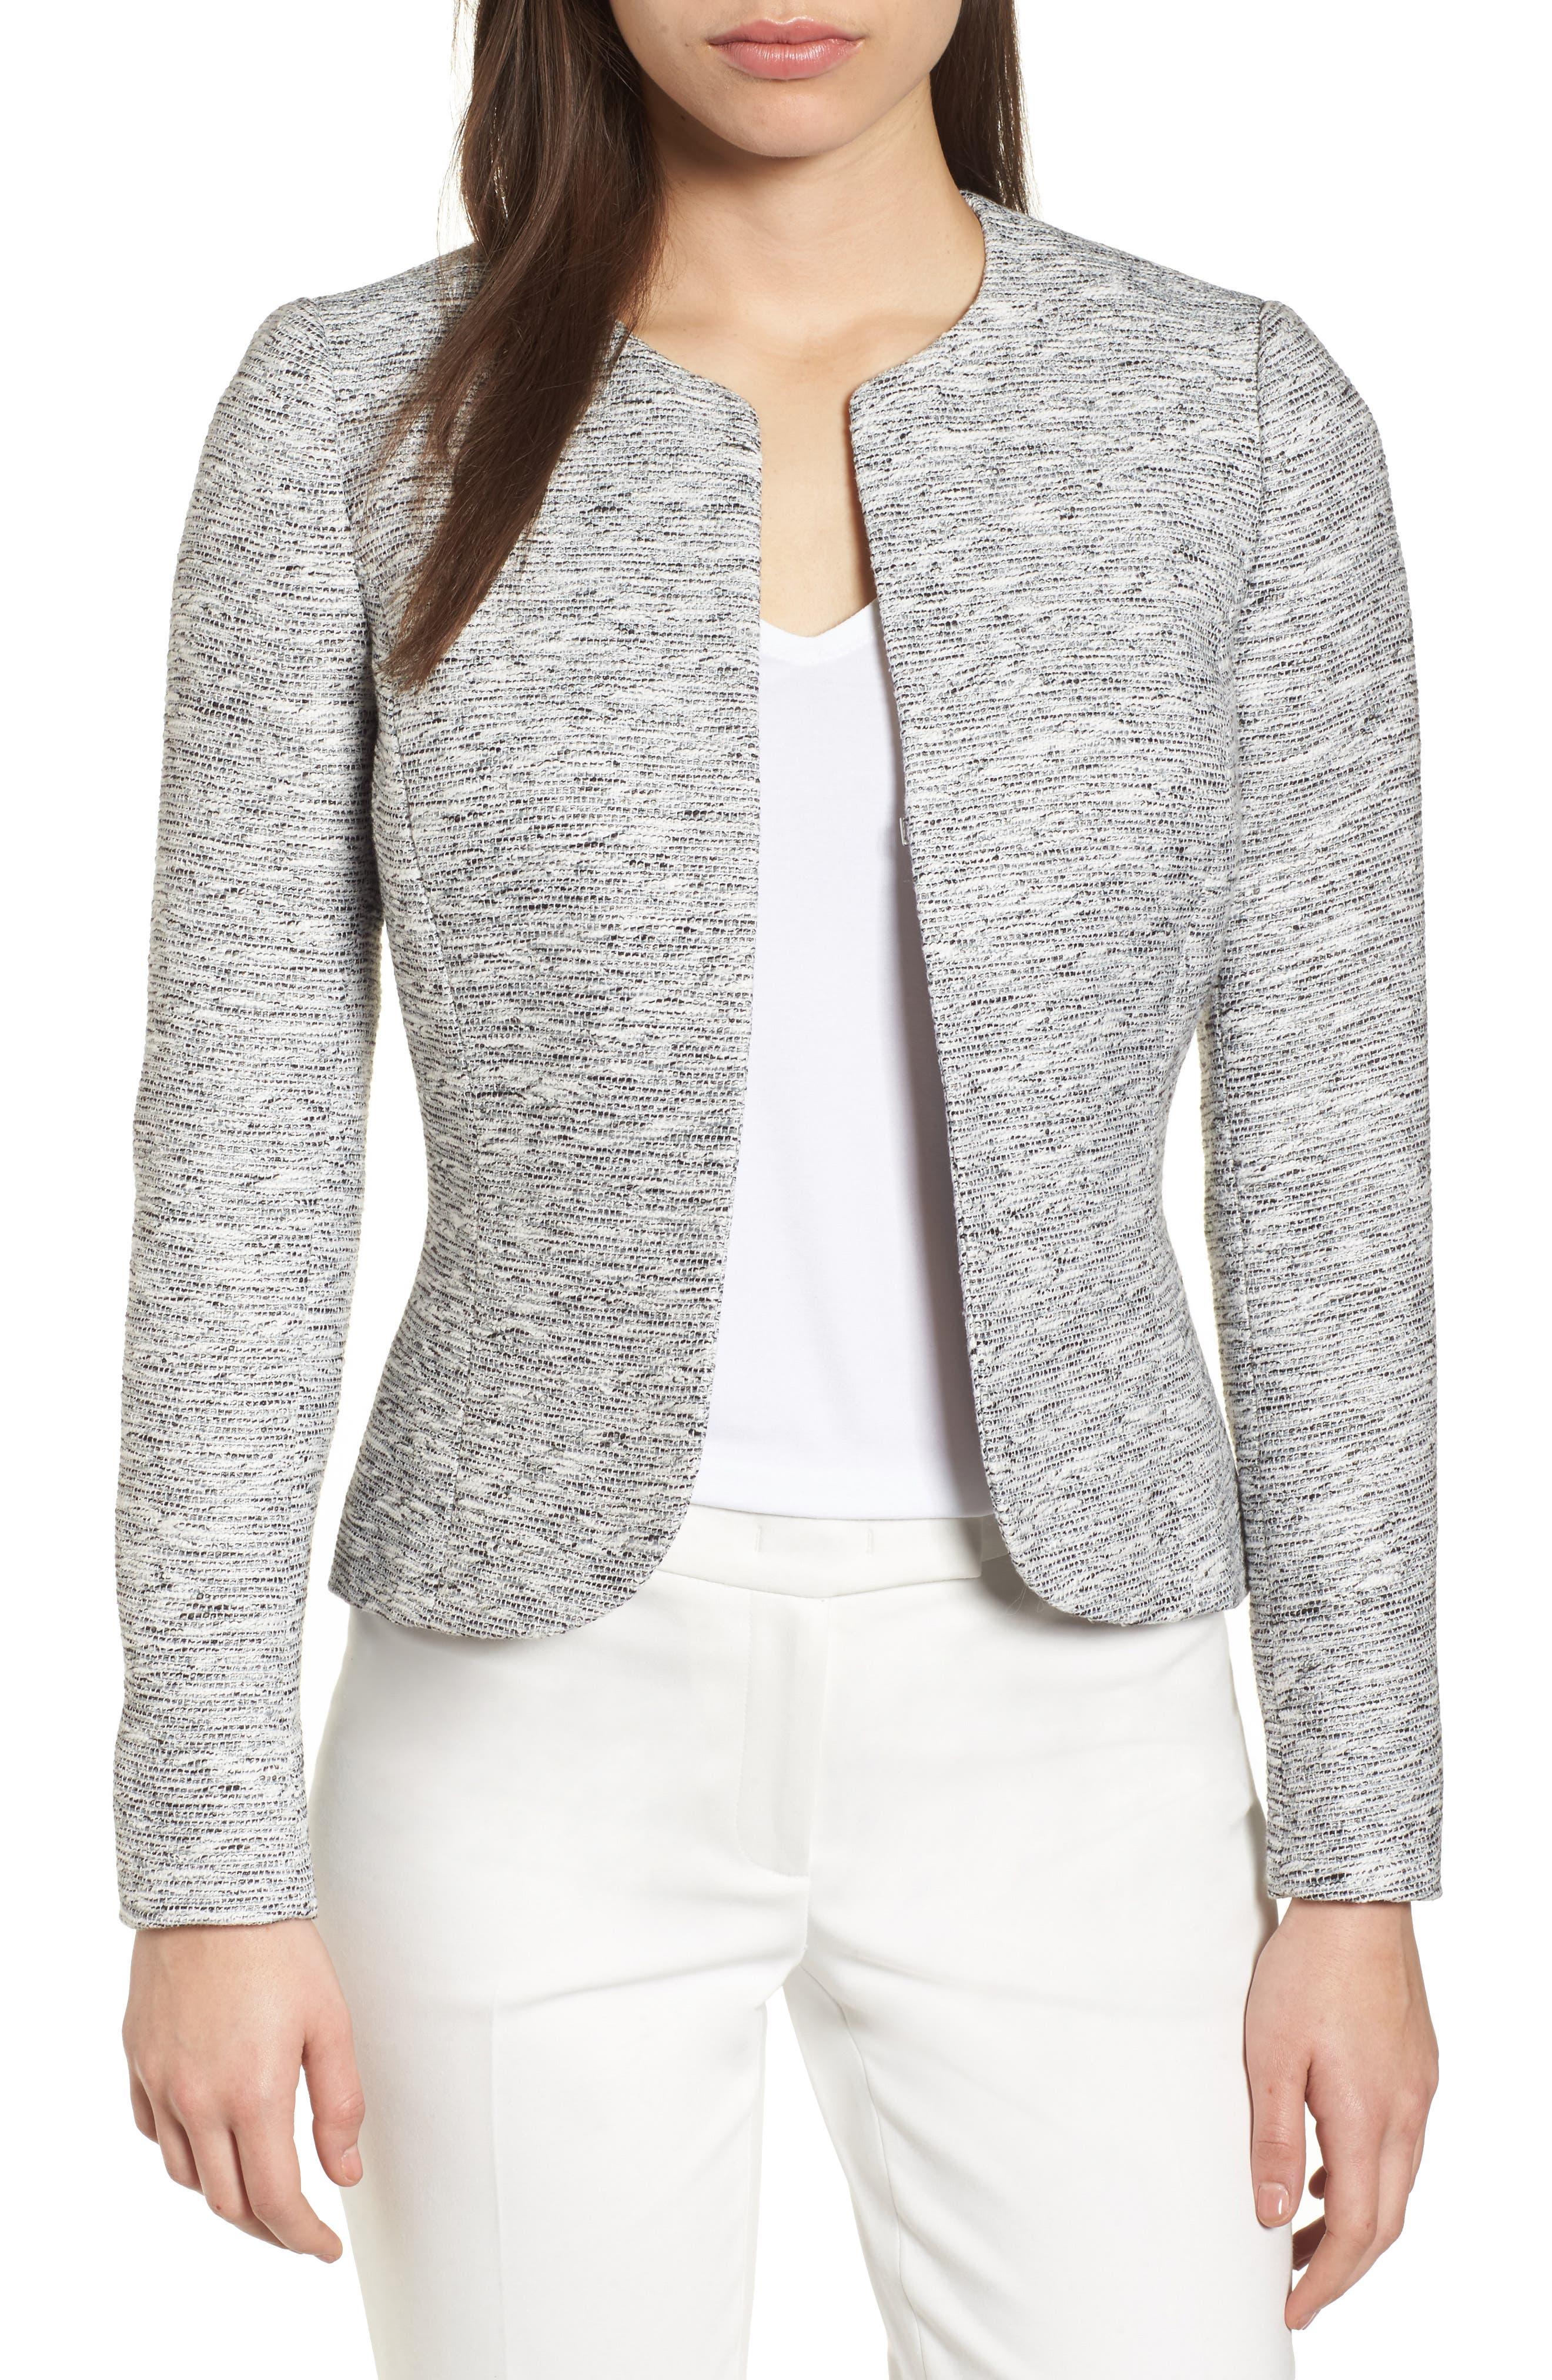 ANNE KLEIN Etched Tweed Jacket, Main, color, 020